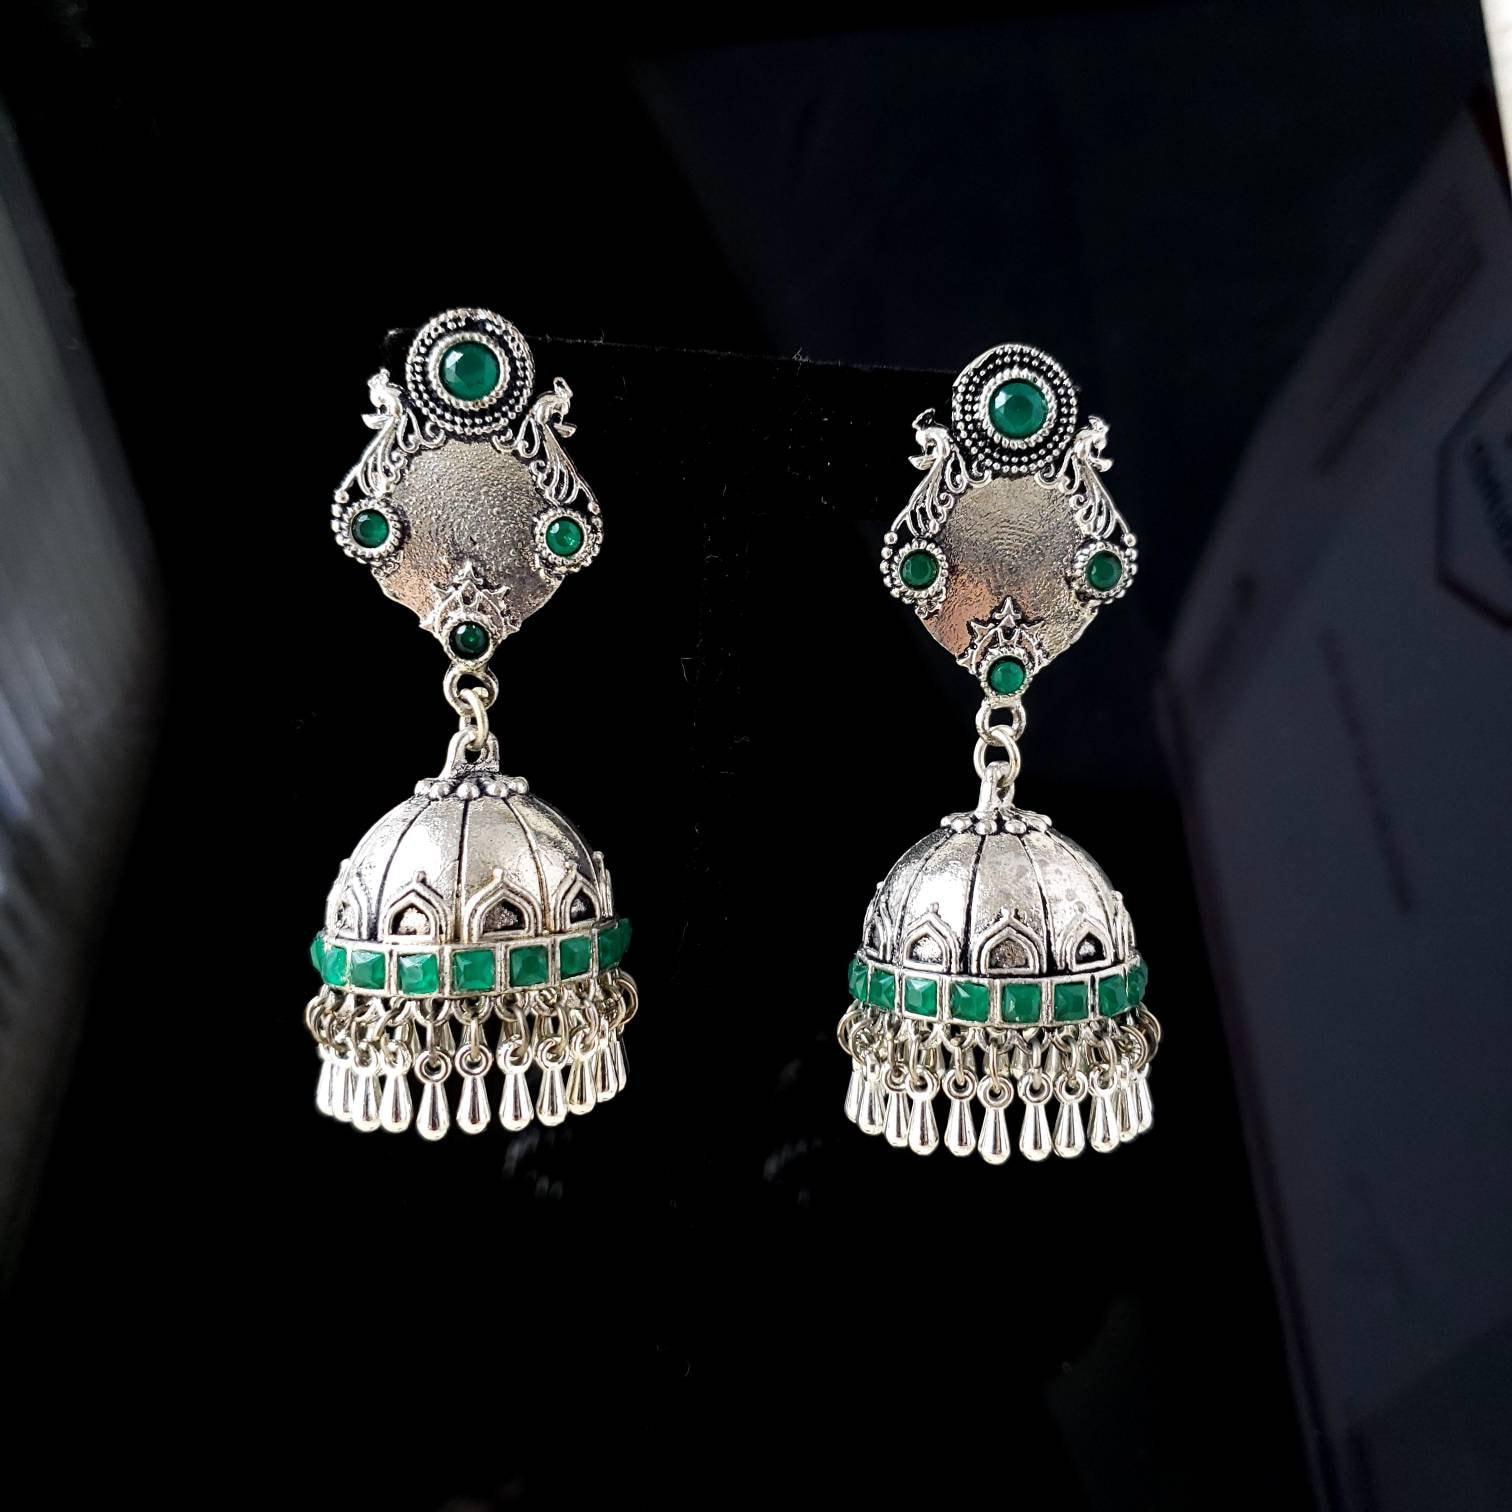 Designer Blue Earrings Oxidized German Silver Earrings Gift For Her Indian Stud Earrings| Blue Gemstone Earrings